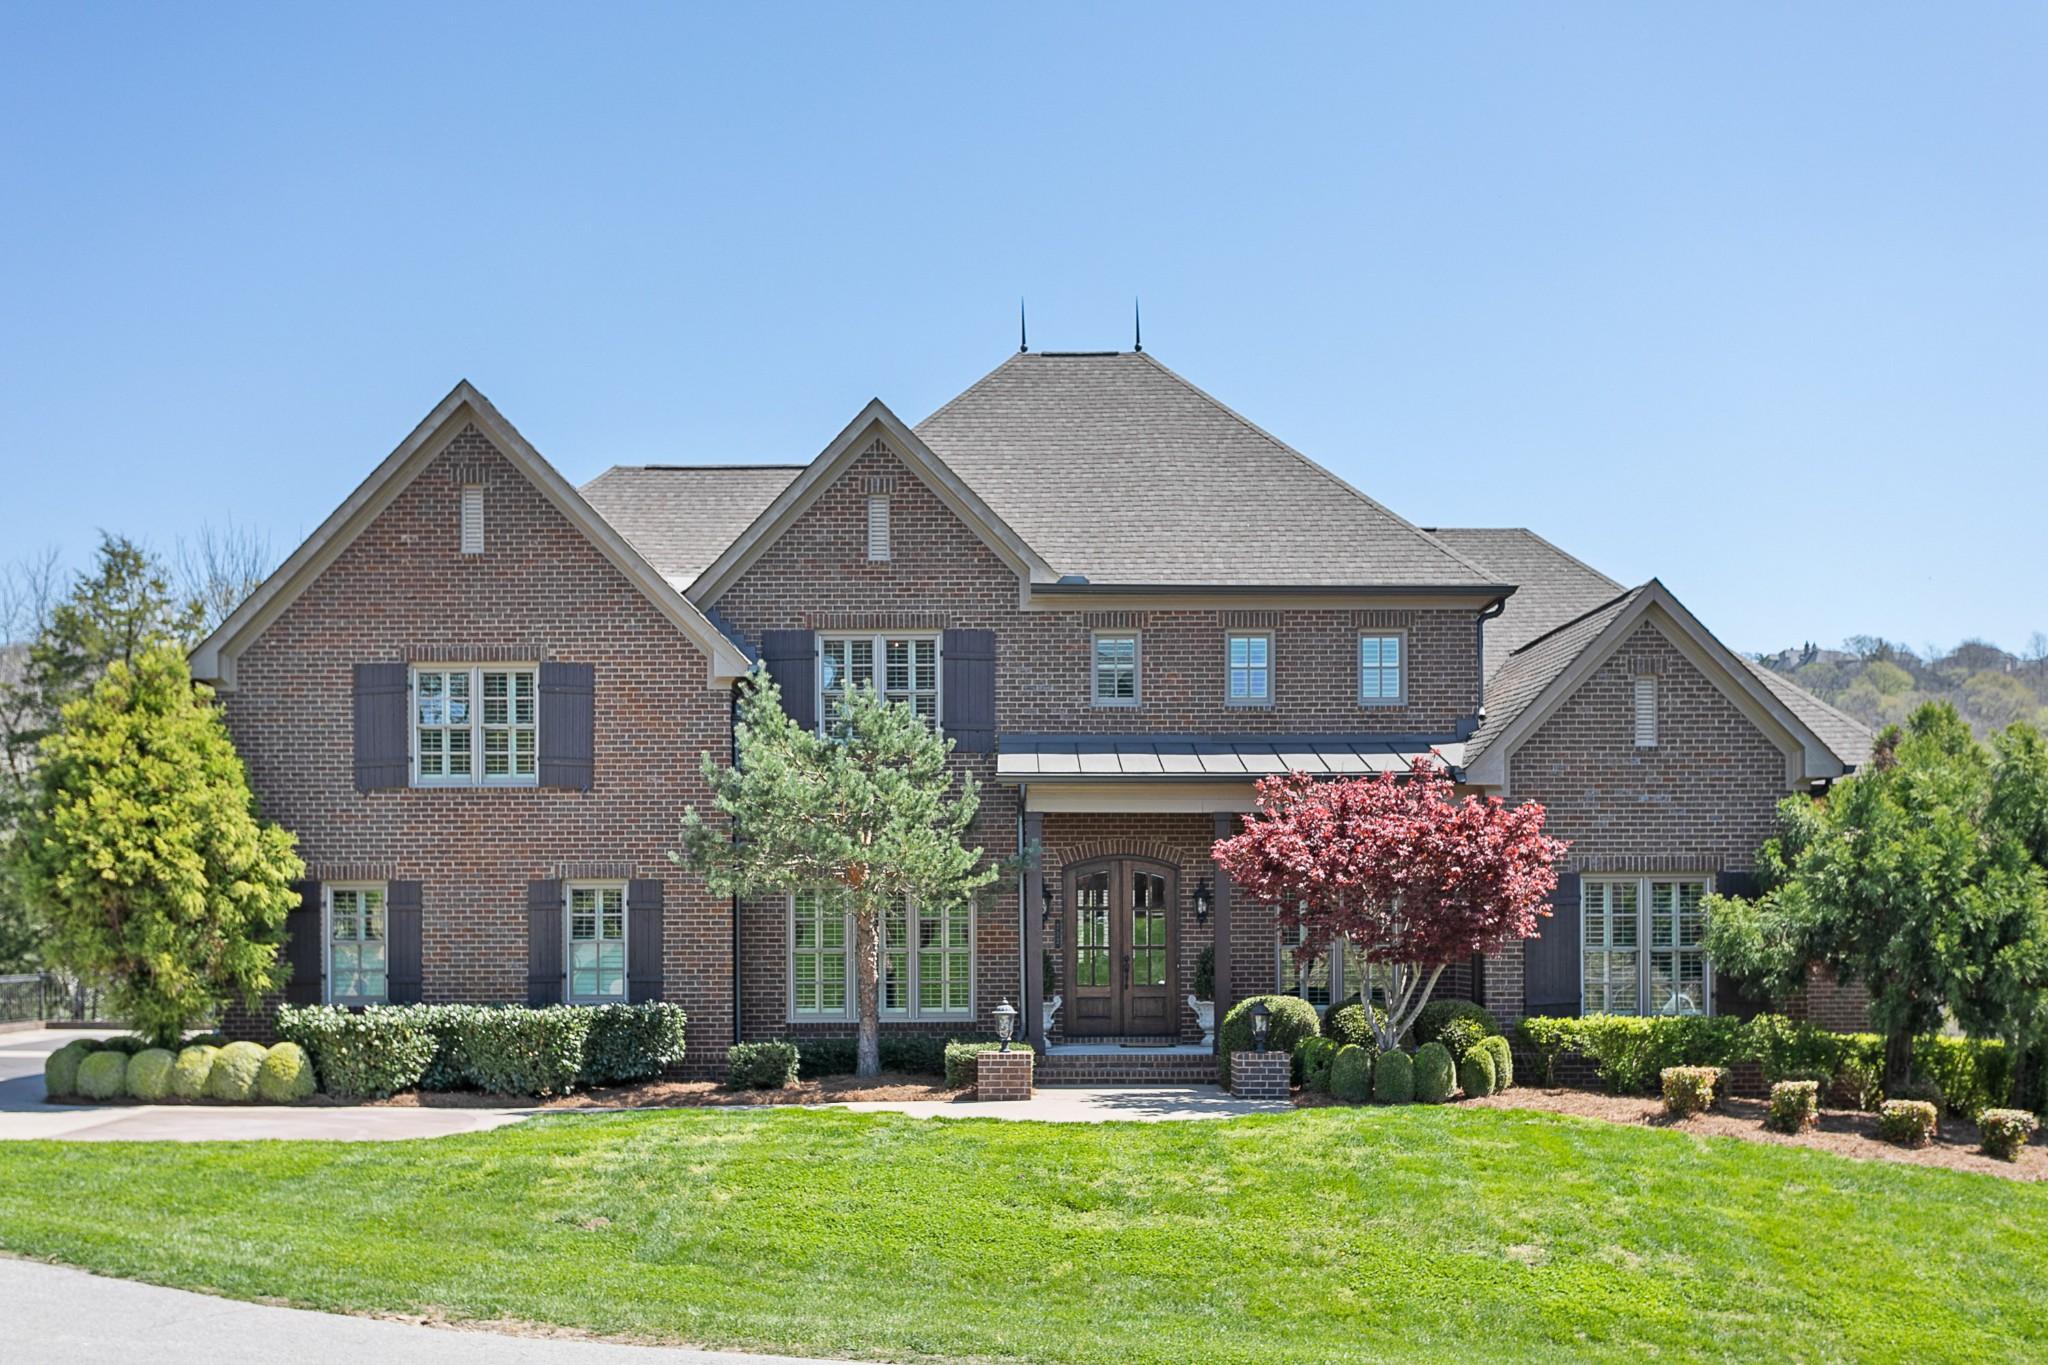 712 Pendragon Ct Property Photo - Franklin, TN real estate listing